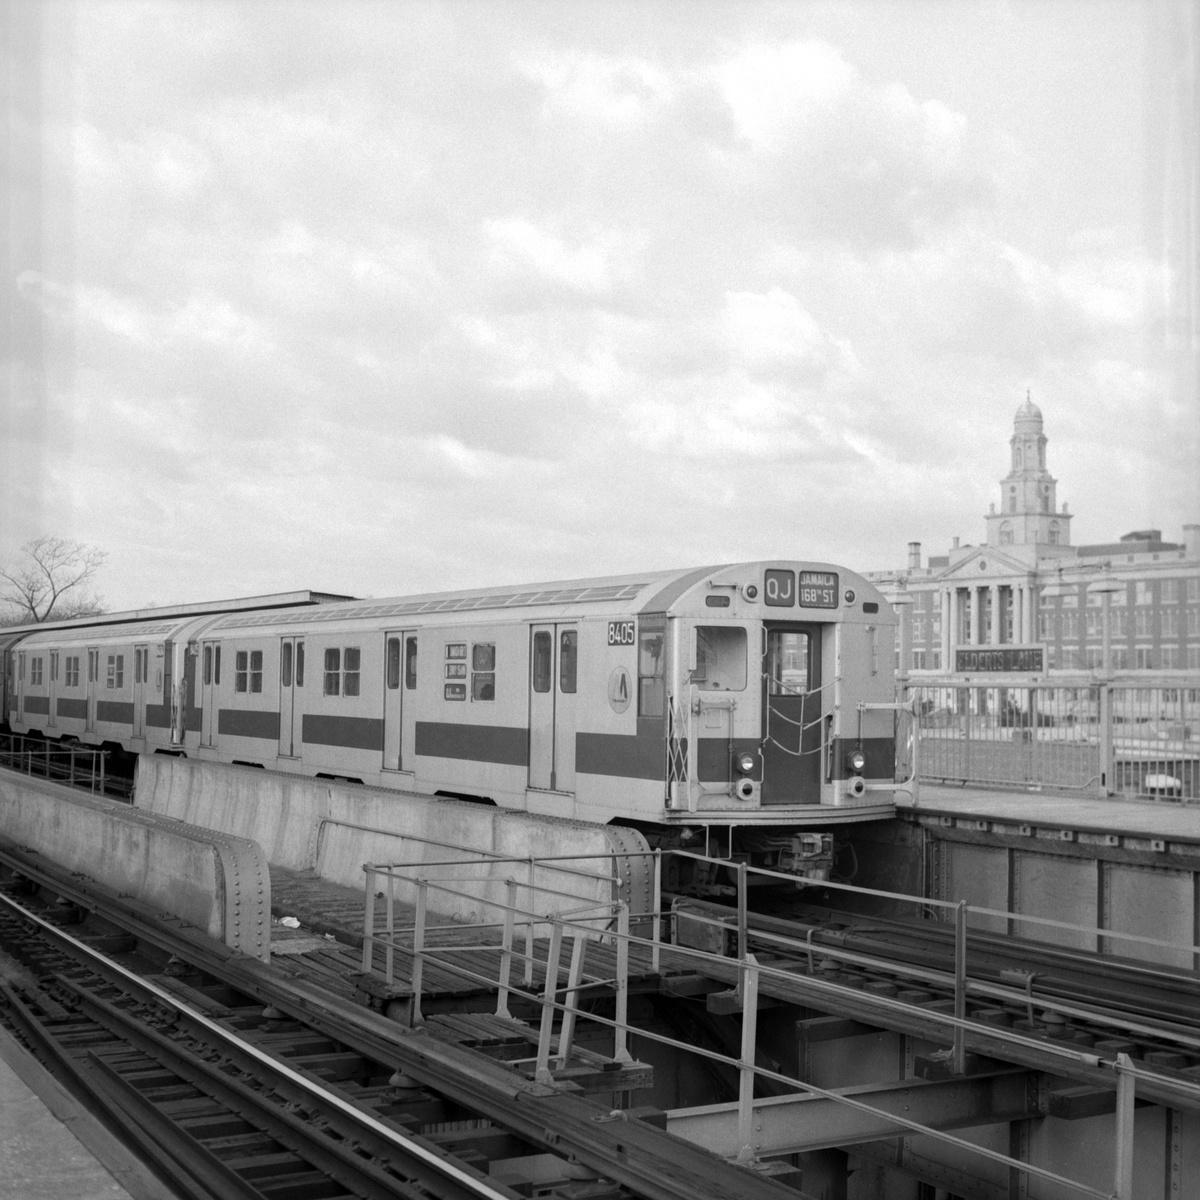 (176k, 1024x762)<br><b>Country:</b> United States<br><b>City:</b> New York<br><b>System:</b> New York City Transit<br><b>Line:</b> BMT Nassau Street/Jamaica Line<br><b>Location:</b> 75th Street/Elderts Lane <br><b>Route:</b> QJ<br><b>Car:</b> R-30 (St. Louis, 1961) 8405 <br><b>Collection of:</b> George Conrad Collection<br><b>Date:</b> 11/2/1970<br><b>Viewed (this week/total):</b> 7 / 3197